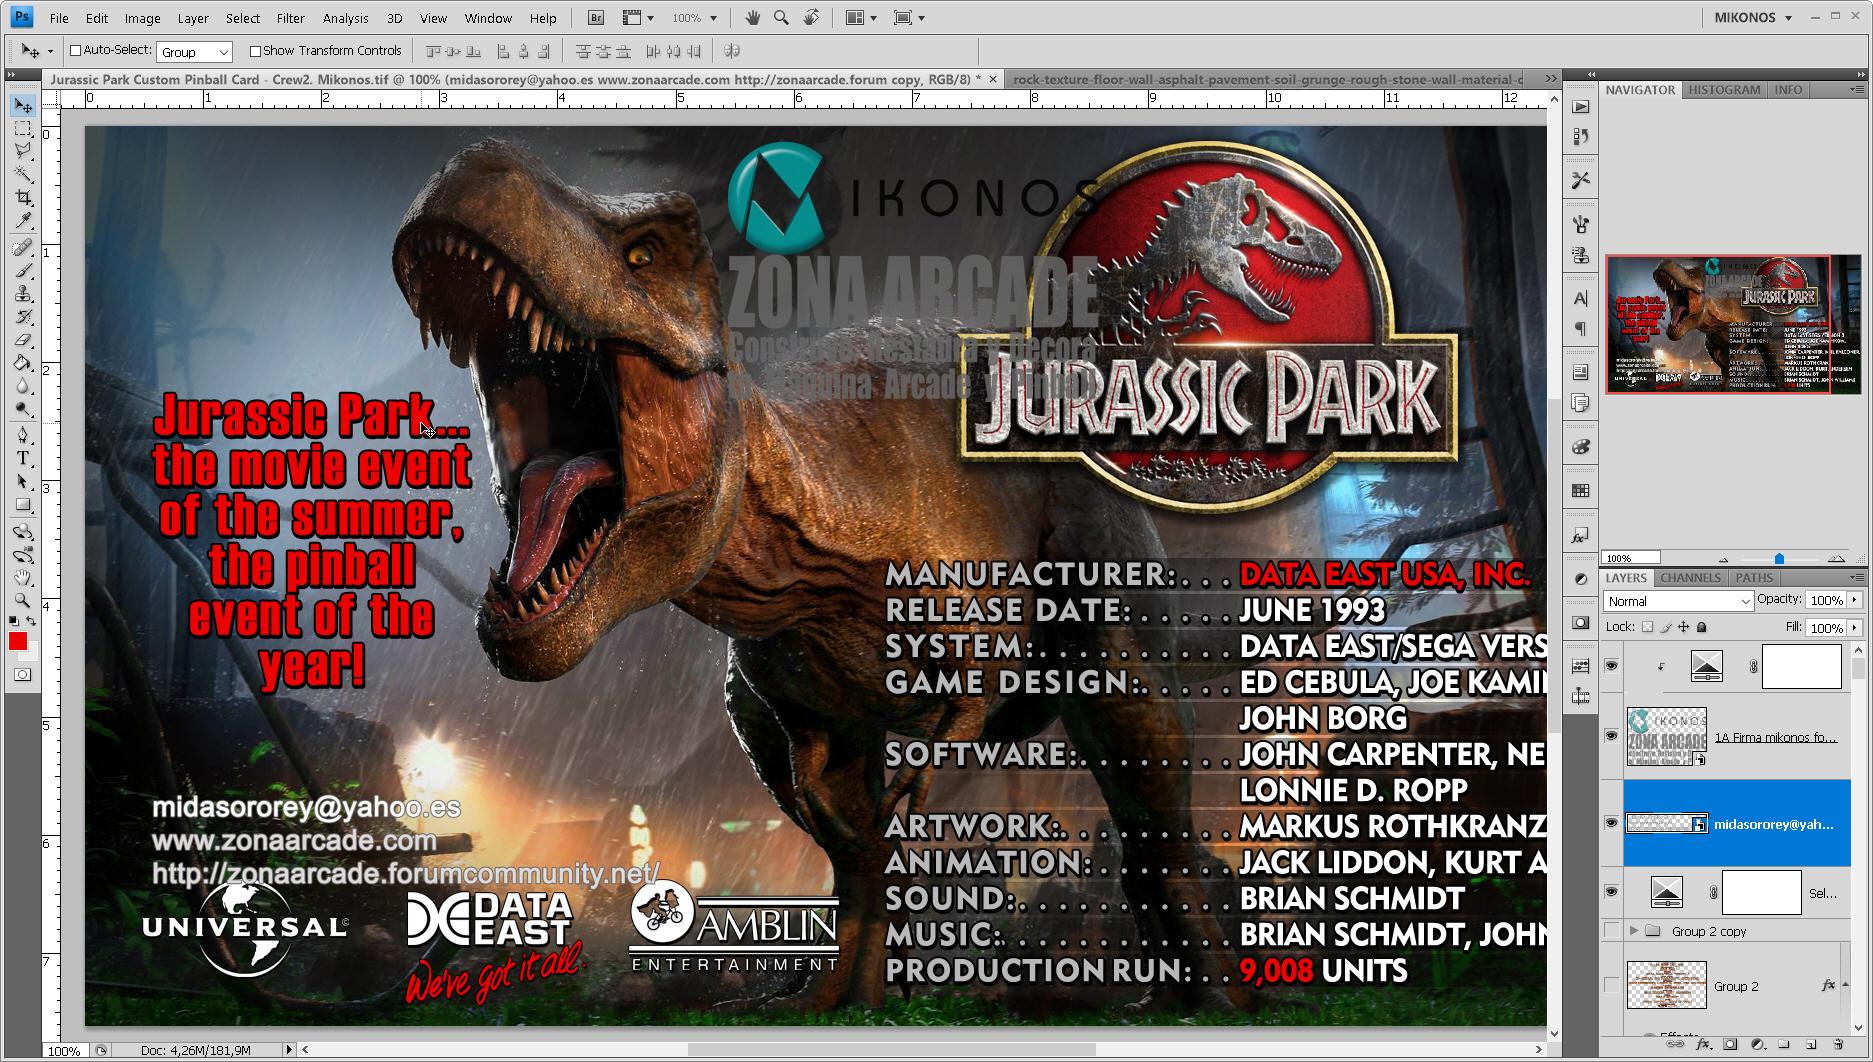 Jurassic%20Park%20Custom%20Pinball%20Card%20-%20Crew.%20Mikonos2.jpg